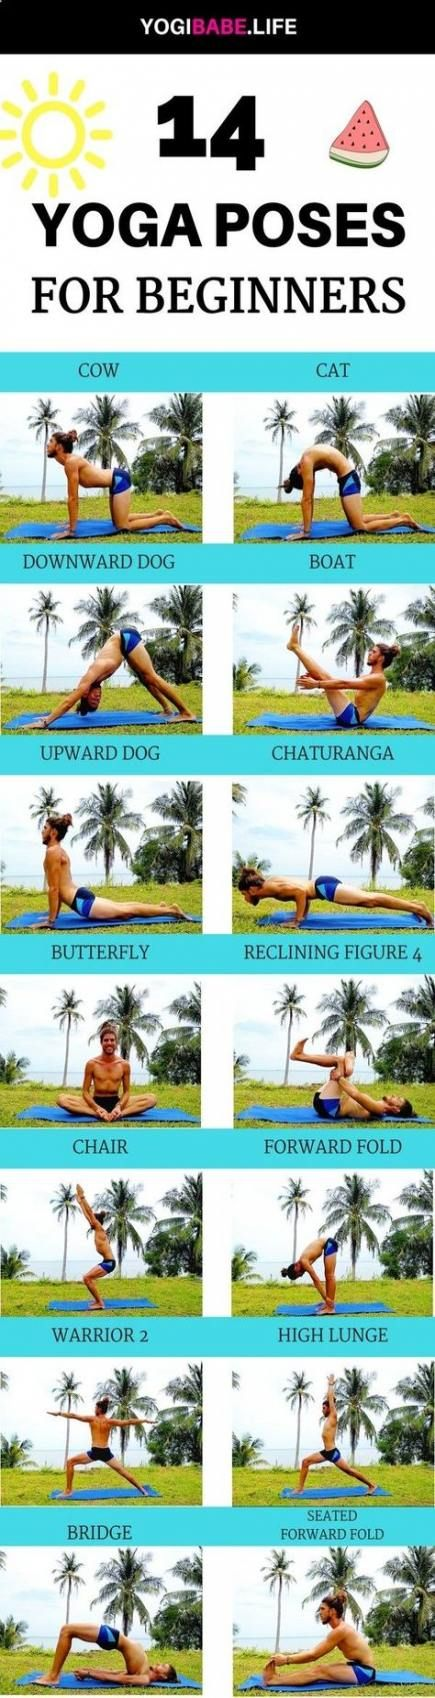 55 Trendy fitness challenge names yoga poses #fitness